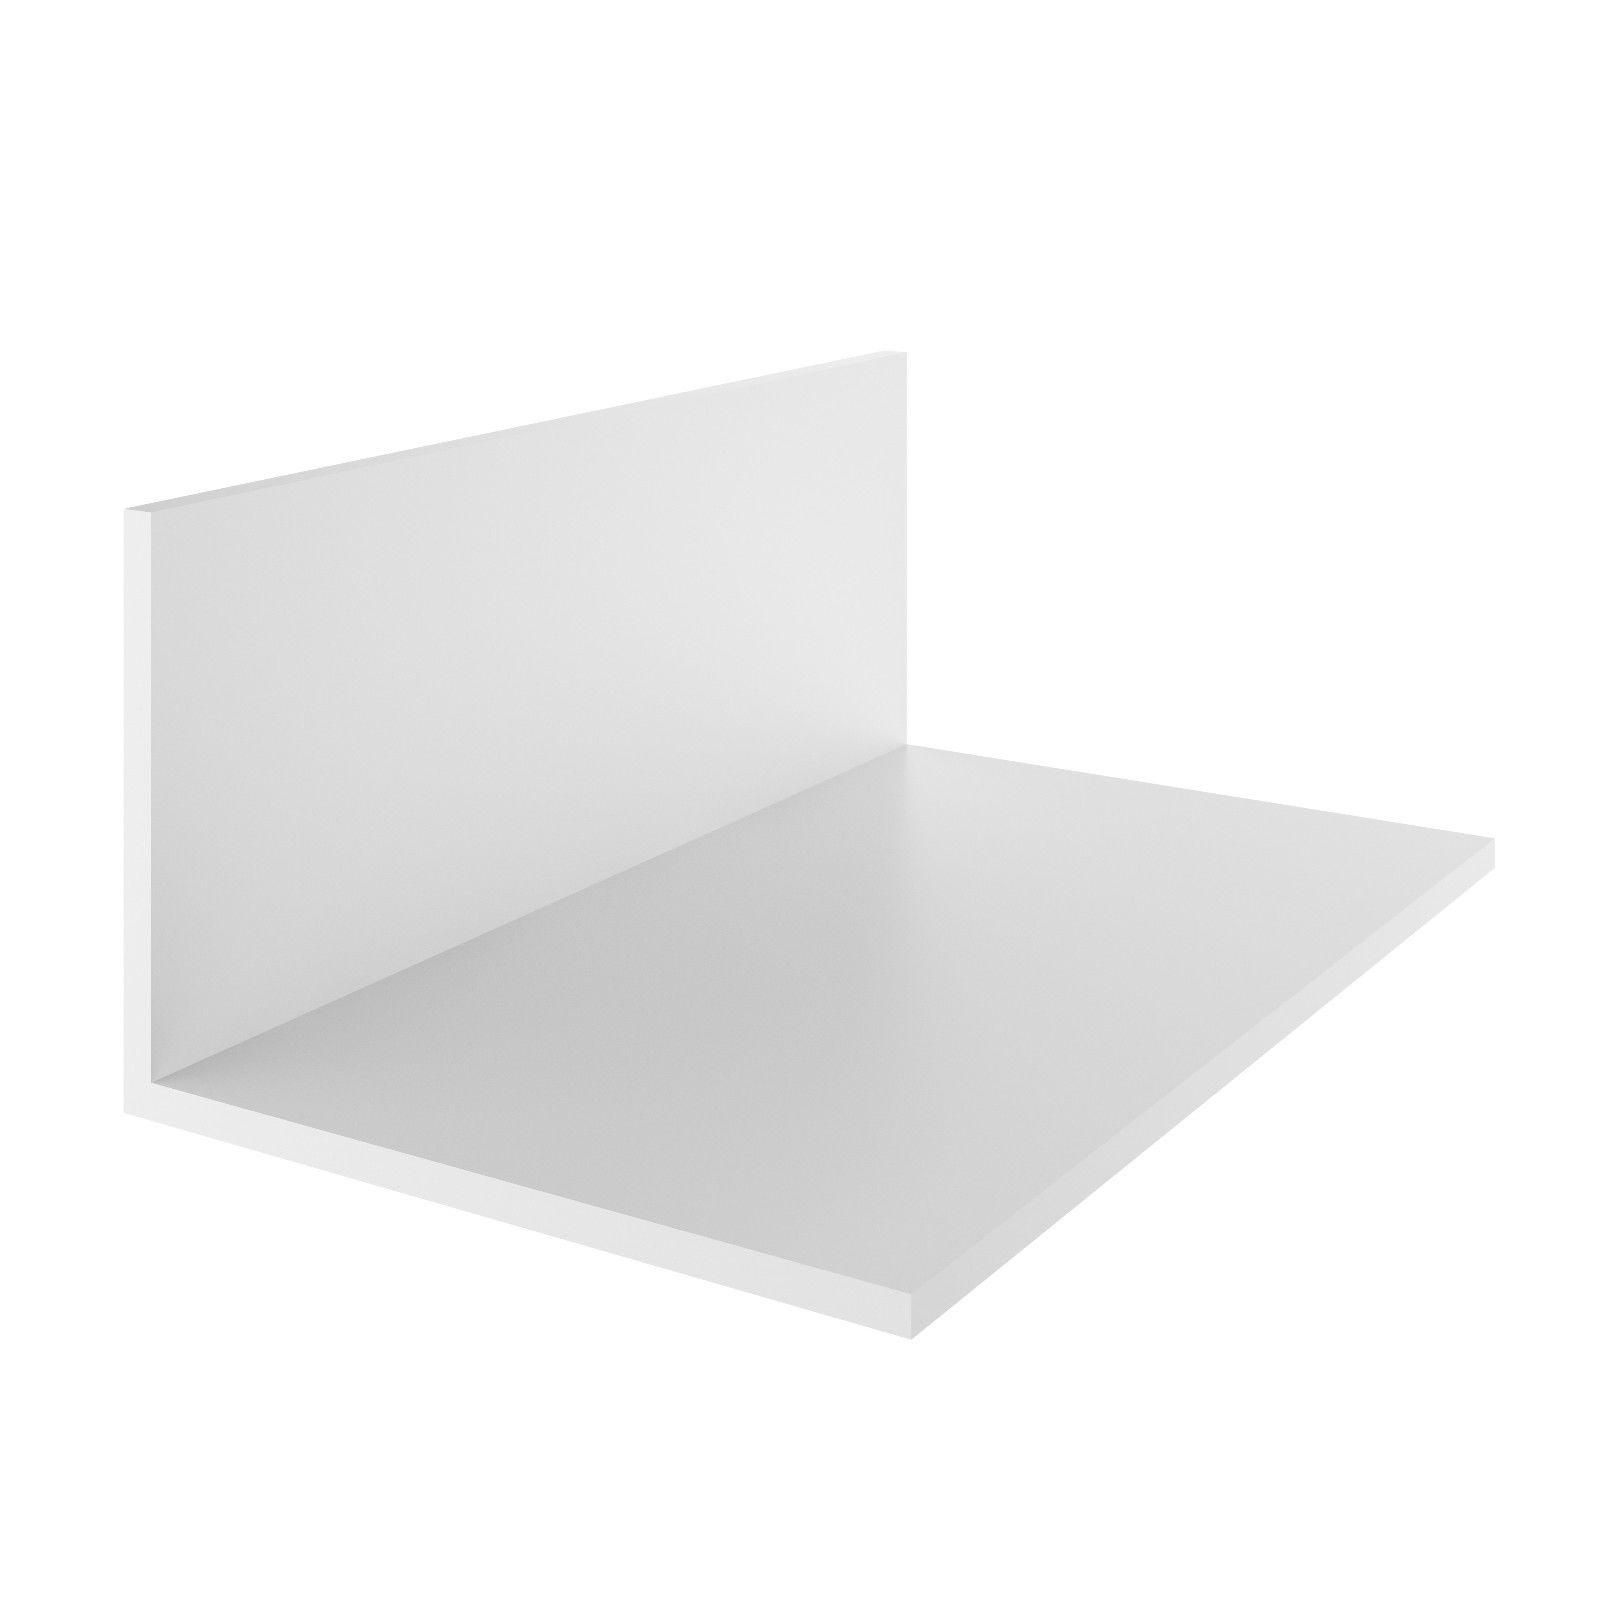 """3,62€/m"" 1,5m Profil Eckleiste Aussenwinkel PVC-Winkel Winkelprofil    50x50 mm"